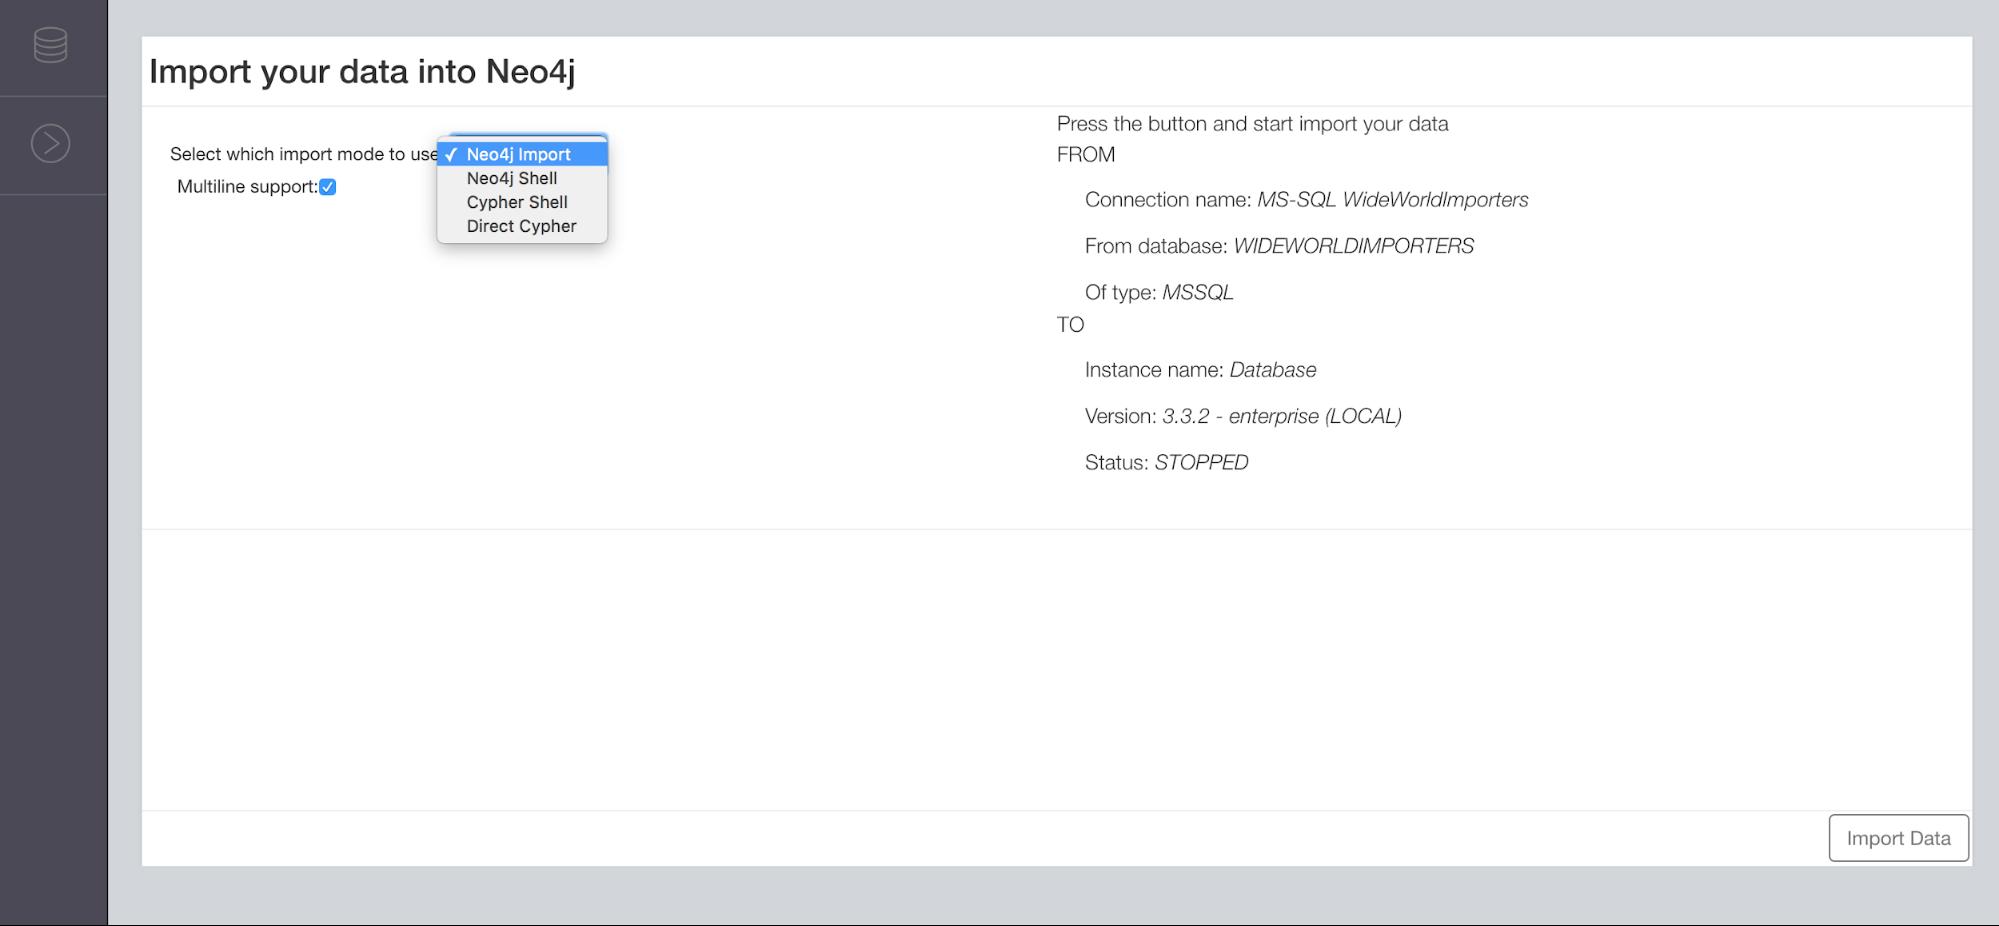 Neo4j ETL 1 2 0 Release: What's New + Demo